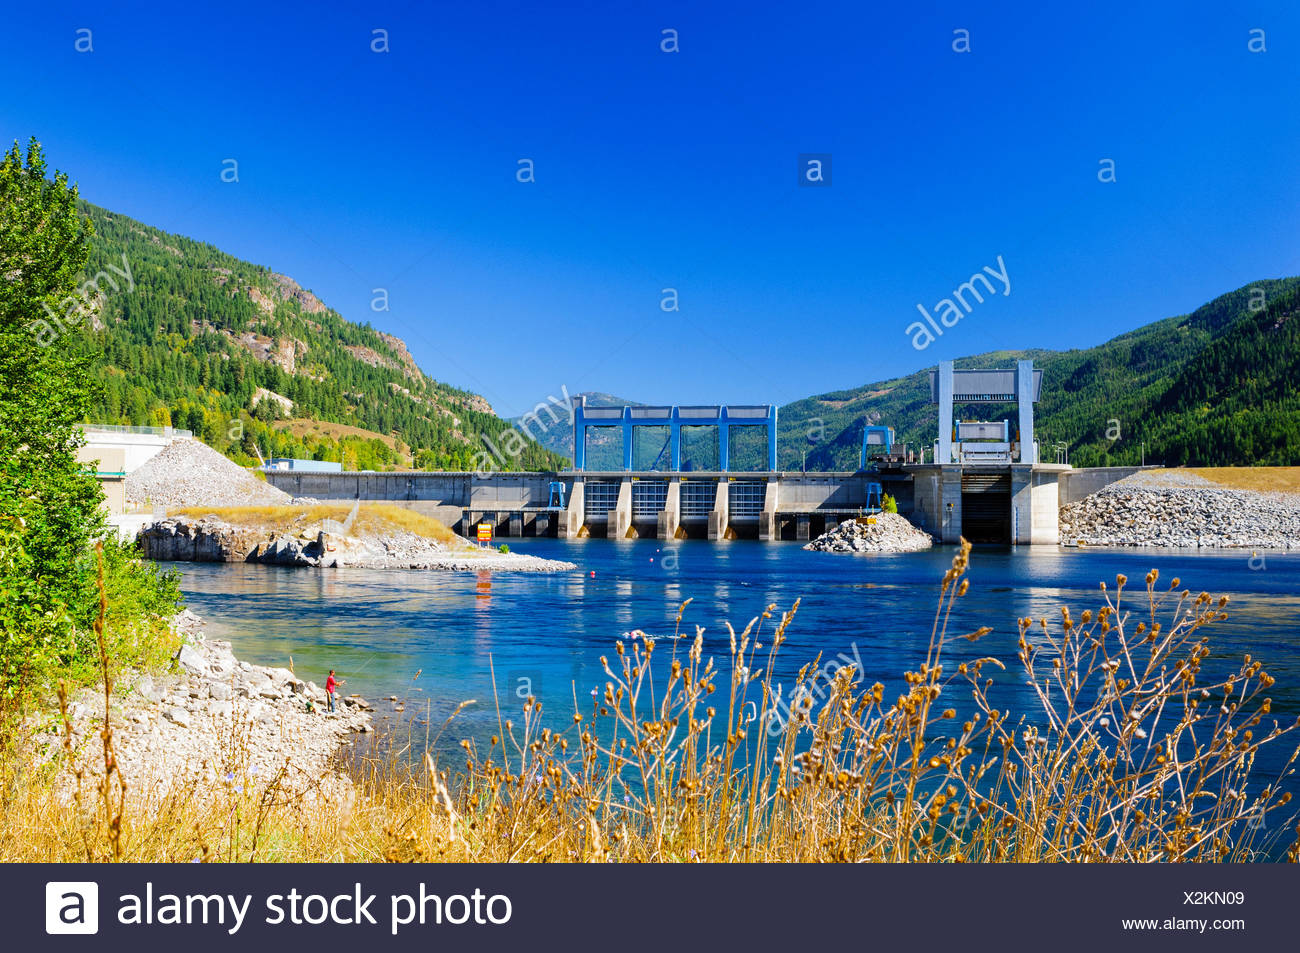 A man fishing near the Hugh Keenleyside Dam on the Columbia River near Castlegar, British Columbia. - Stock Image